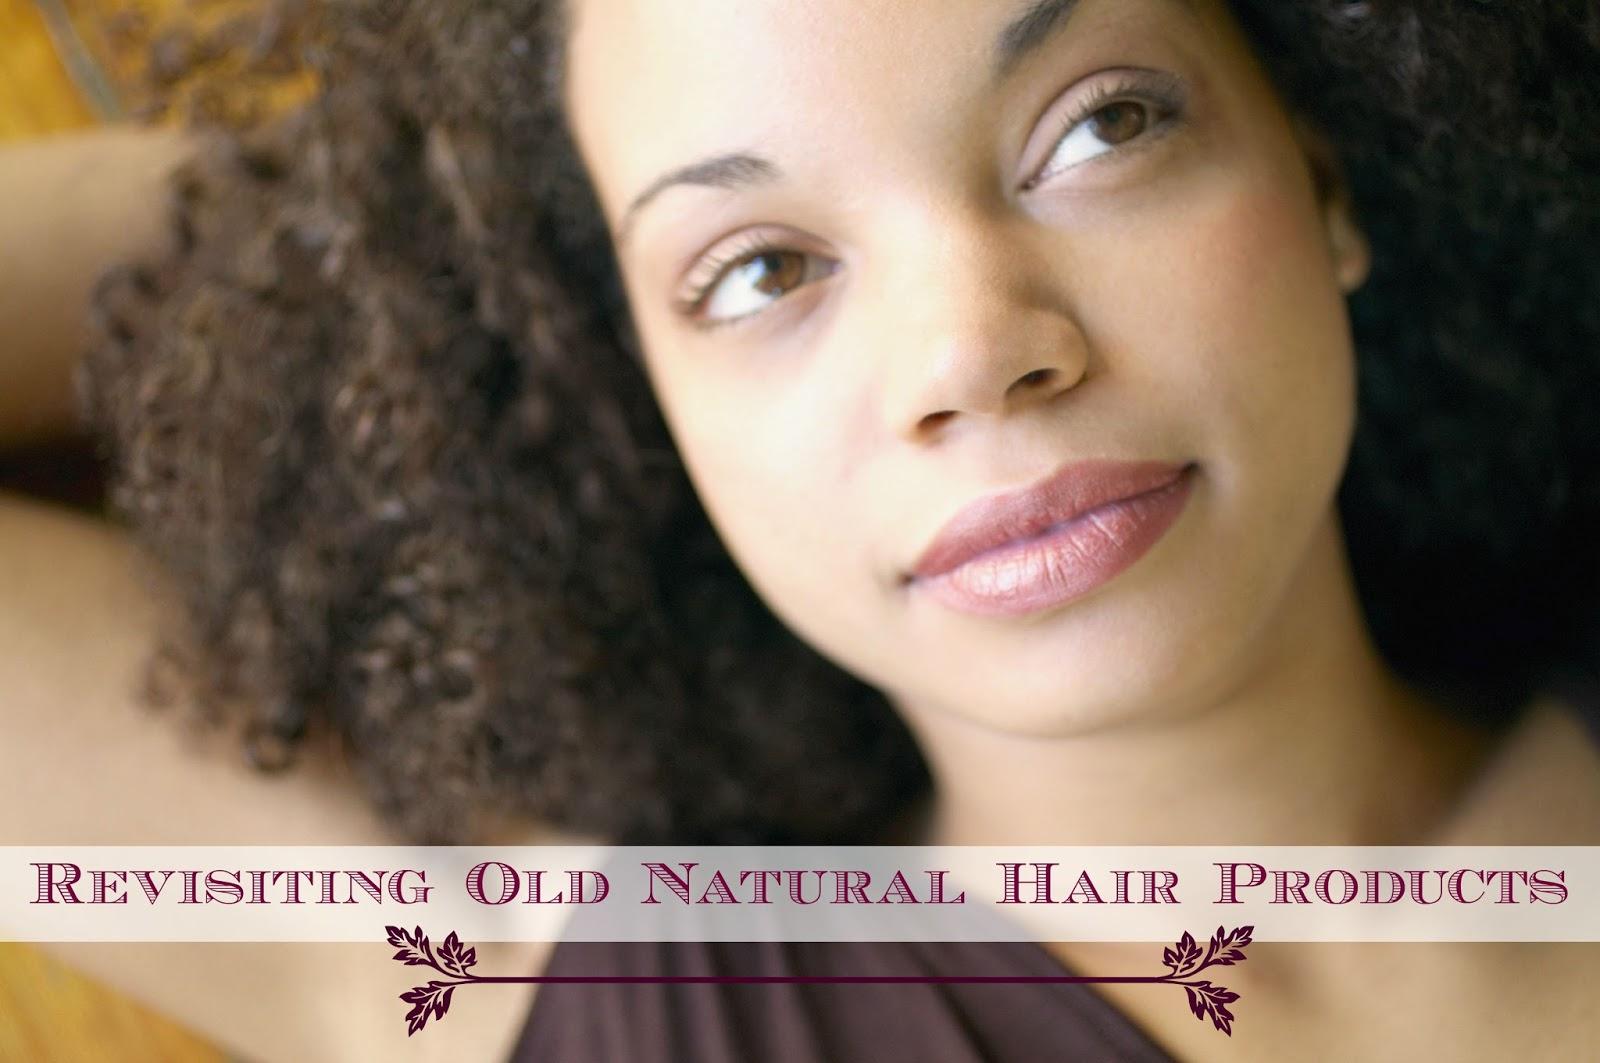 Revisiting Old Natural Hair Products